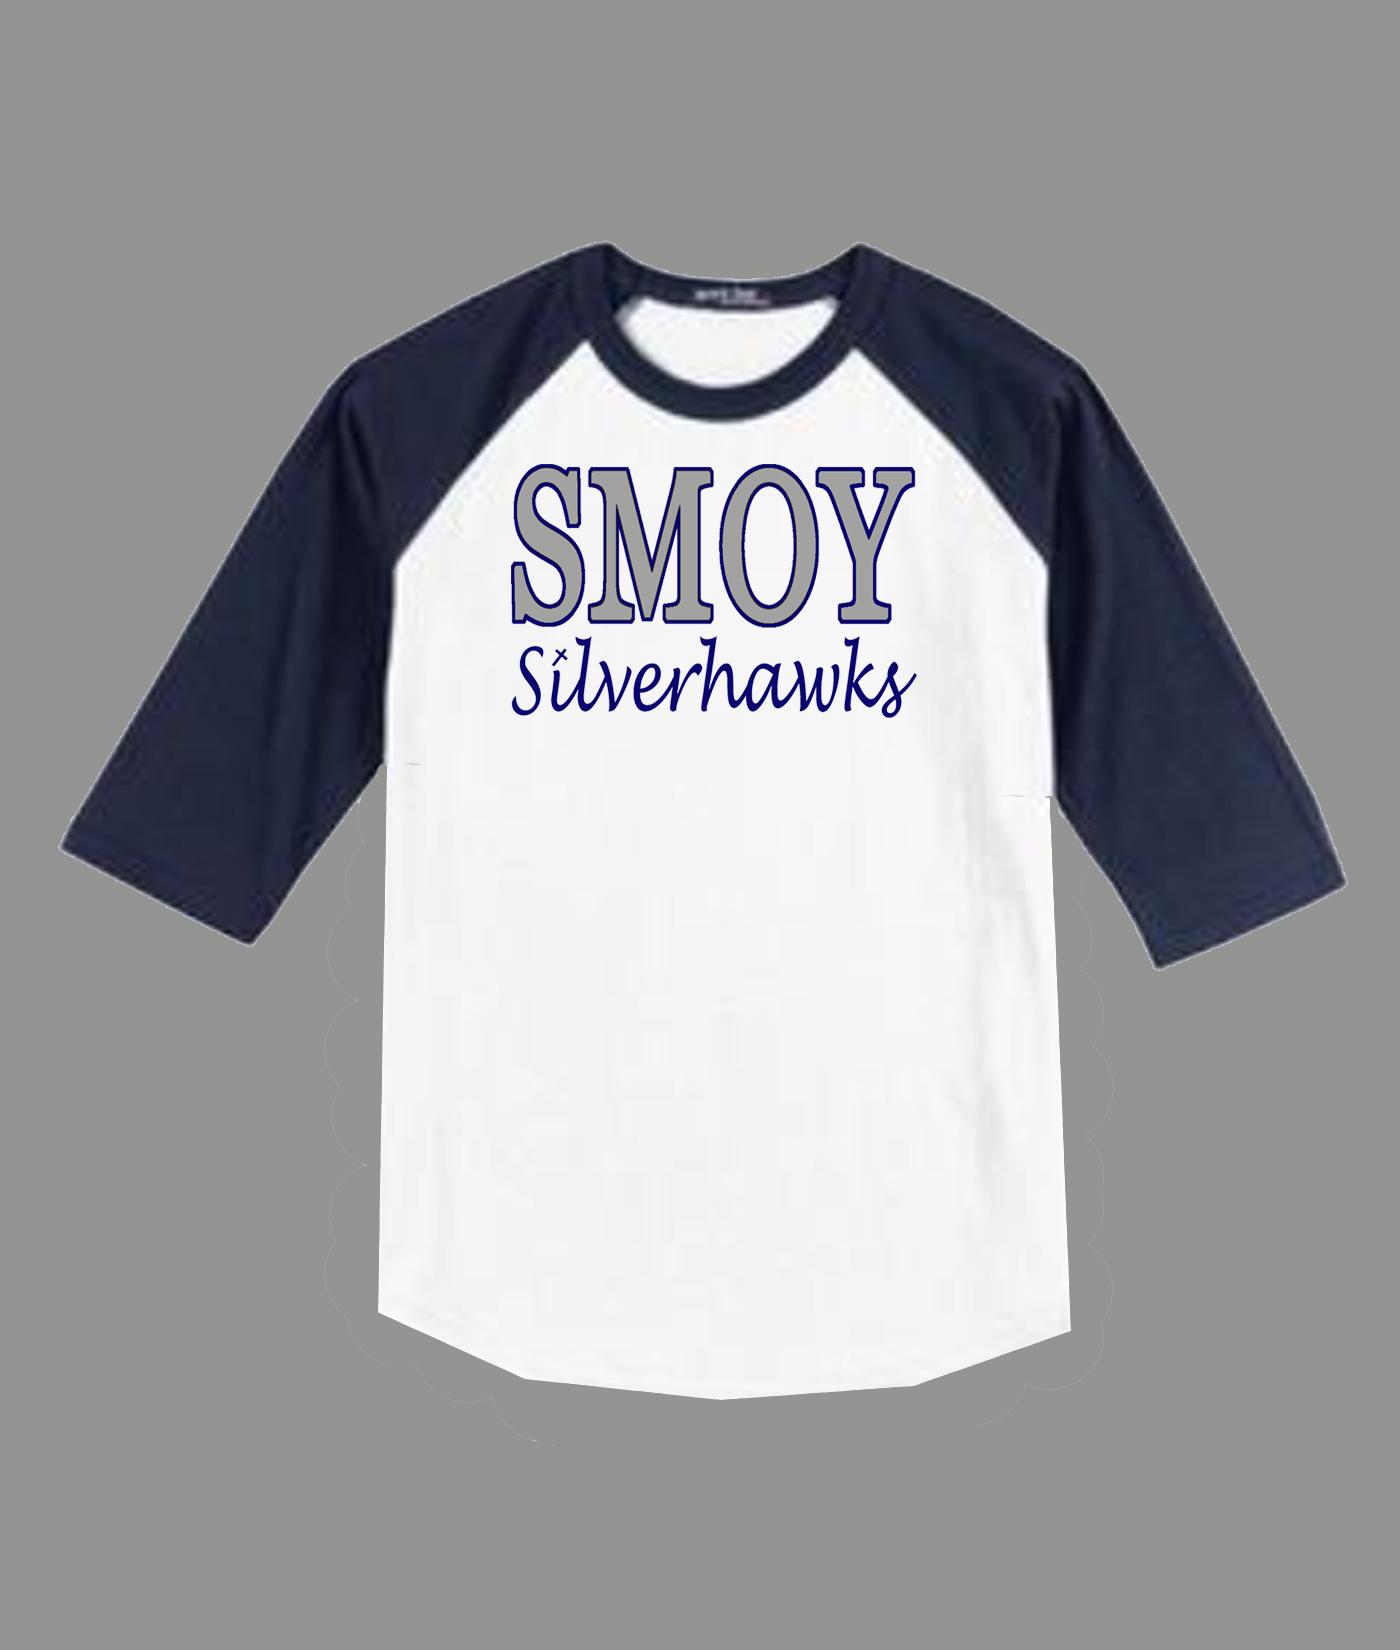 3/4 Sleeve Navy White T-shirt SMOY Original